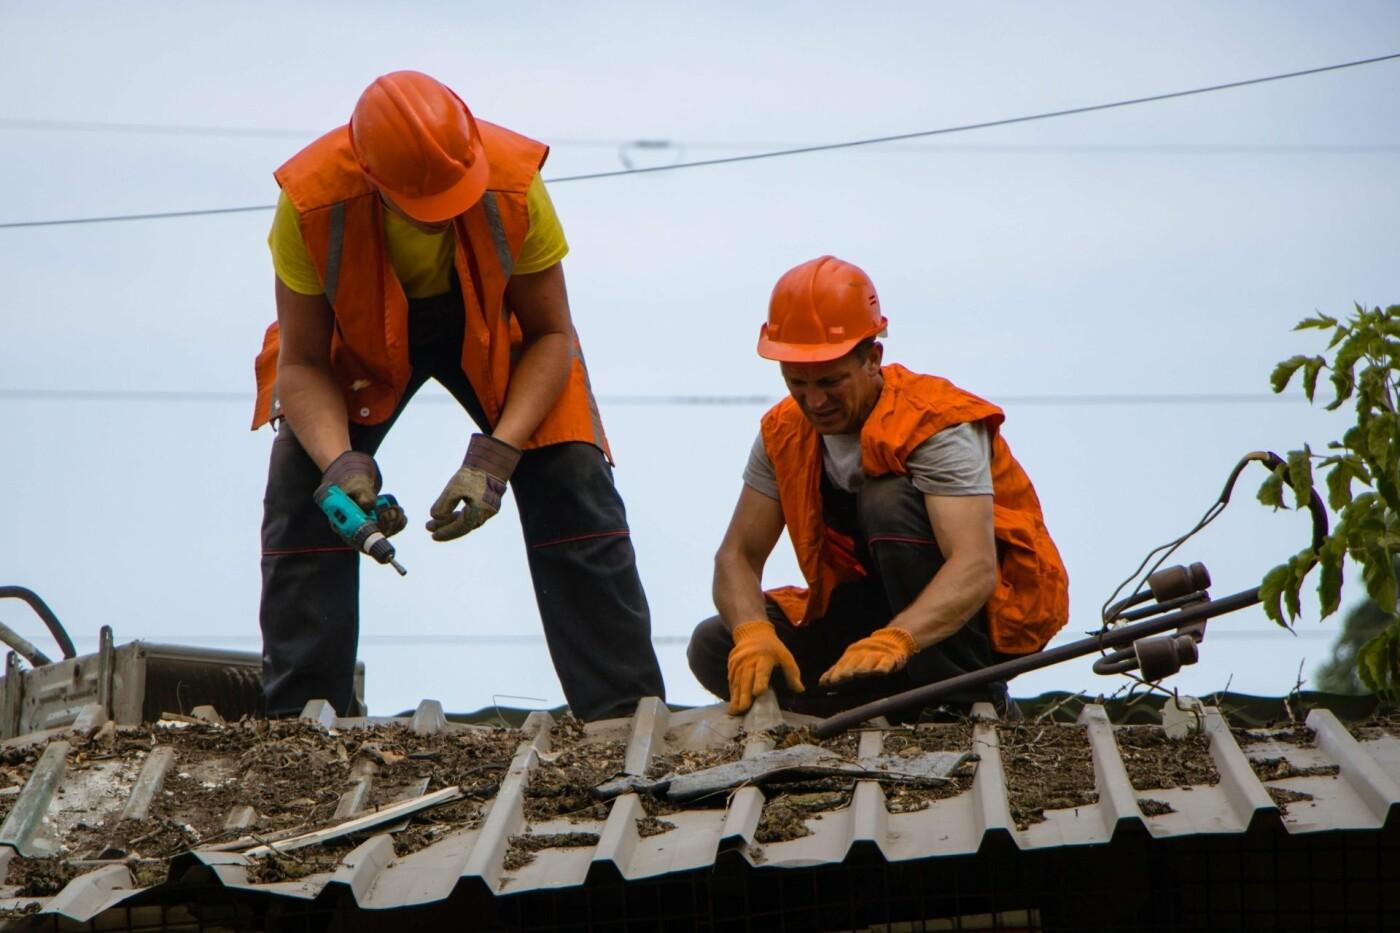 Еще минус одна: в Днепре демонтировали ночную наливайку, - ФОТО, фото-4